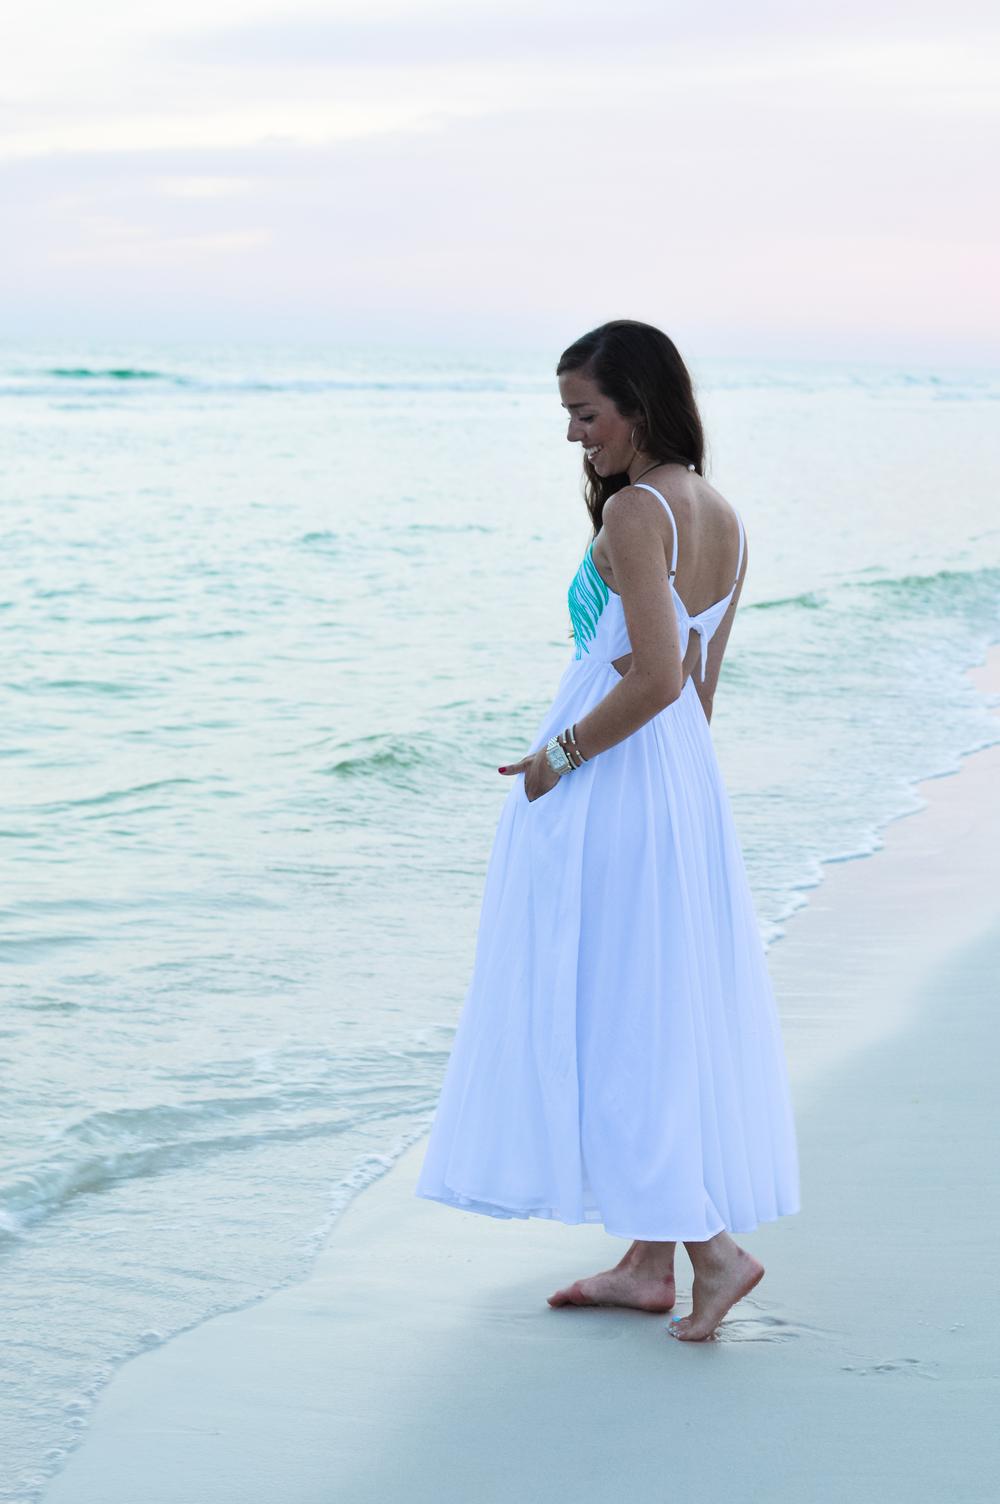 lcb_style_fashion_blogger_seaside florida (26 of 32).jpg